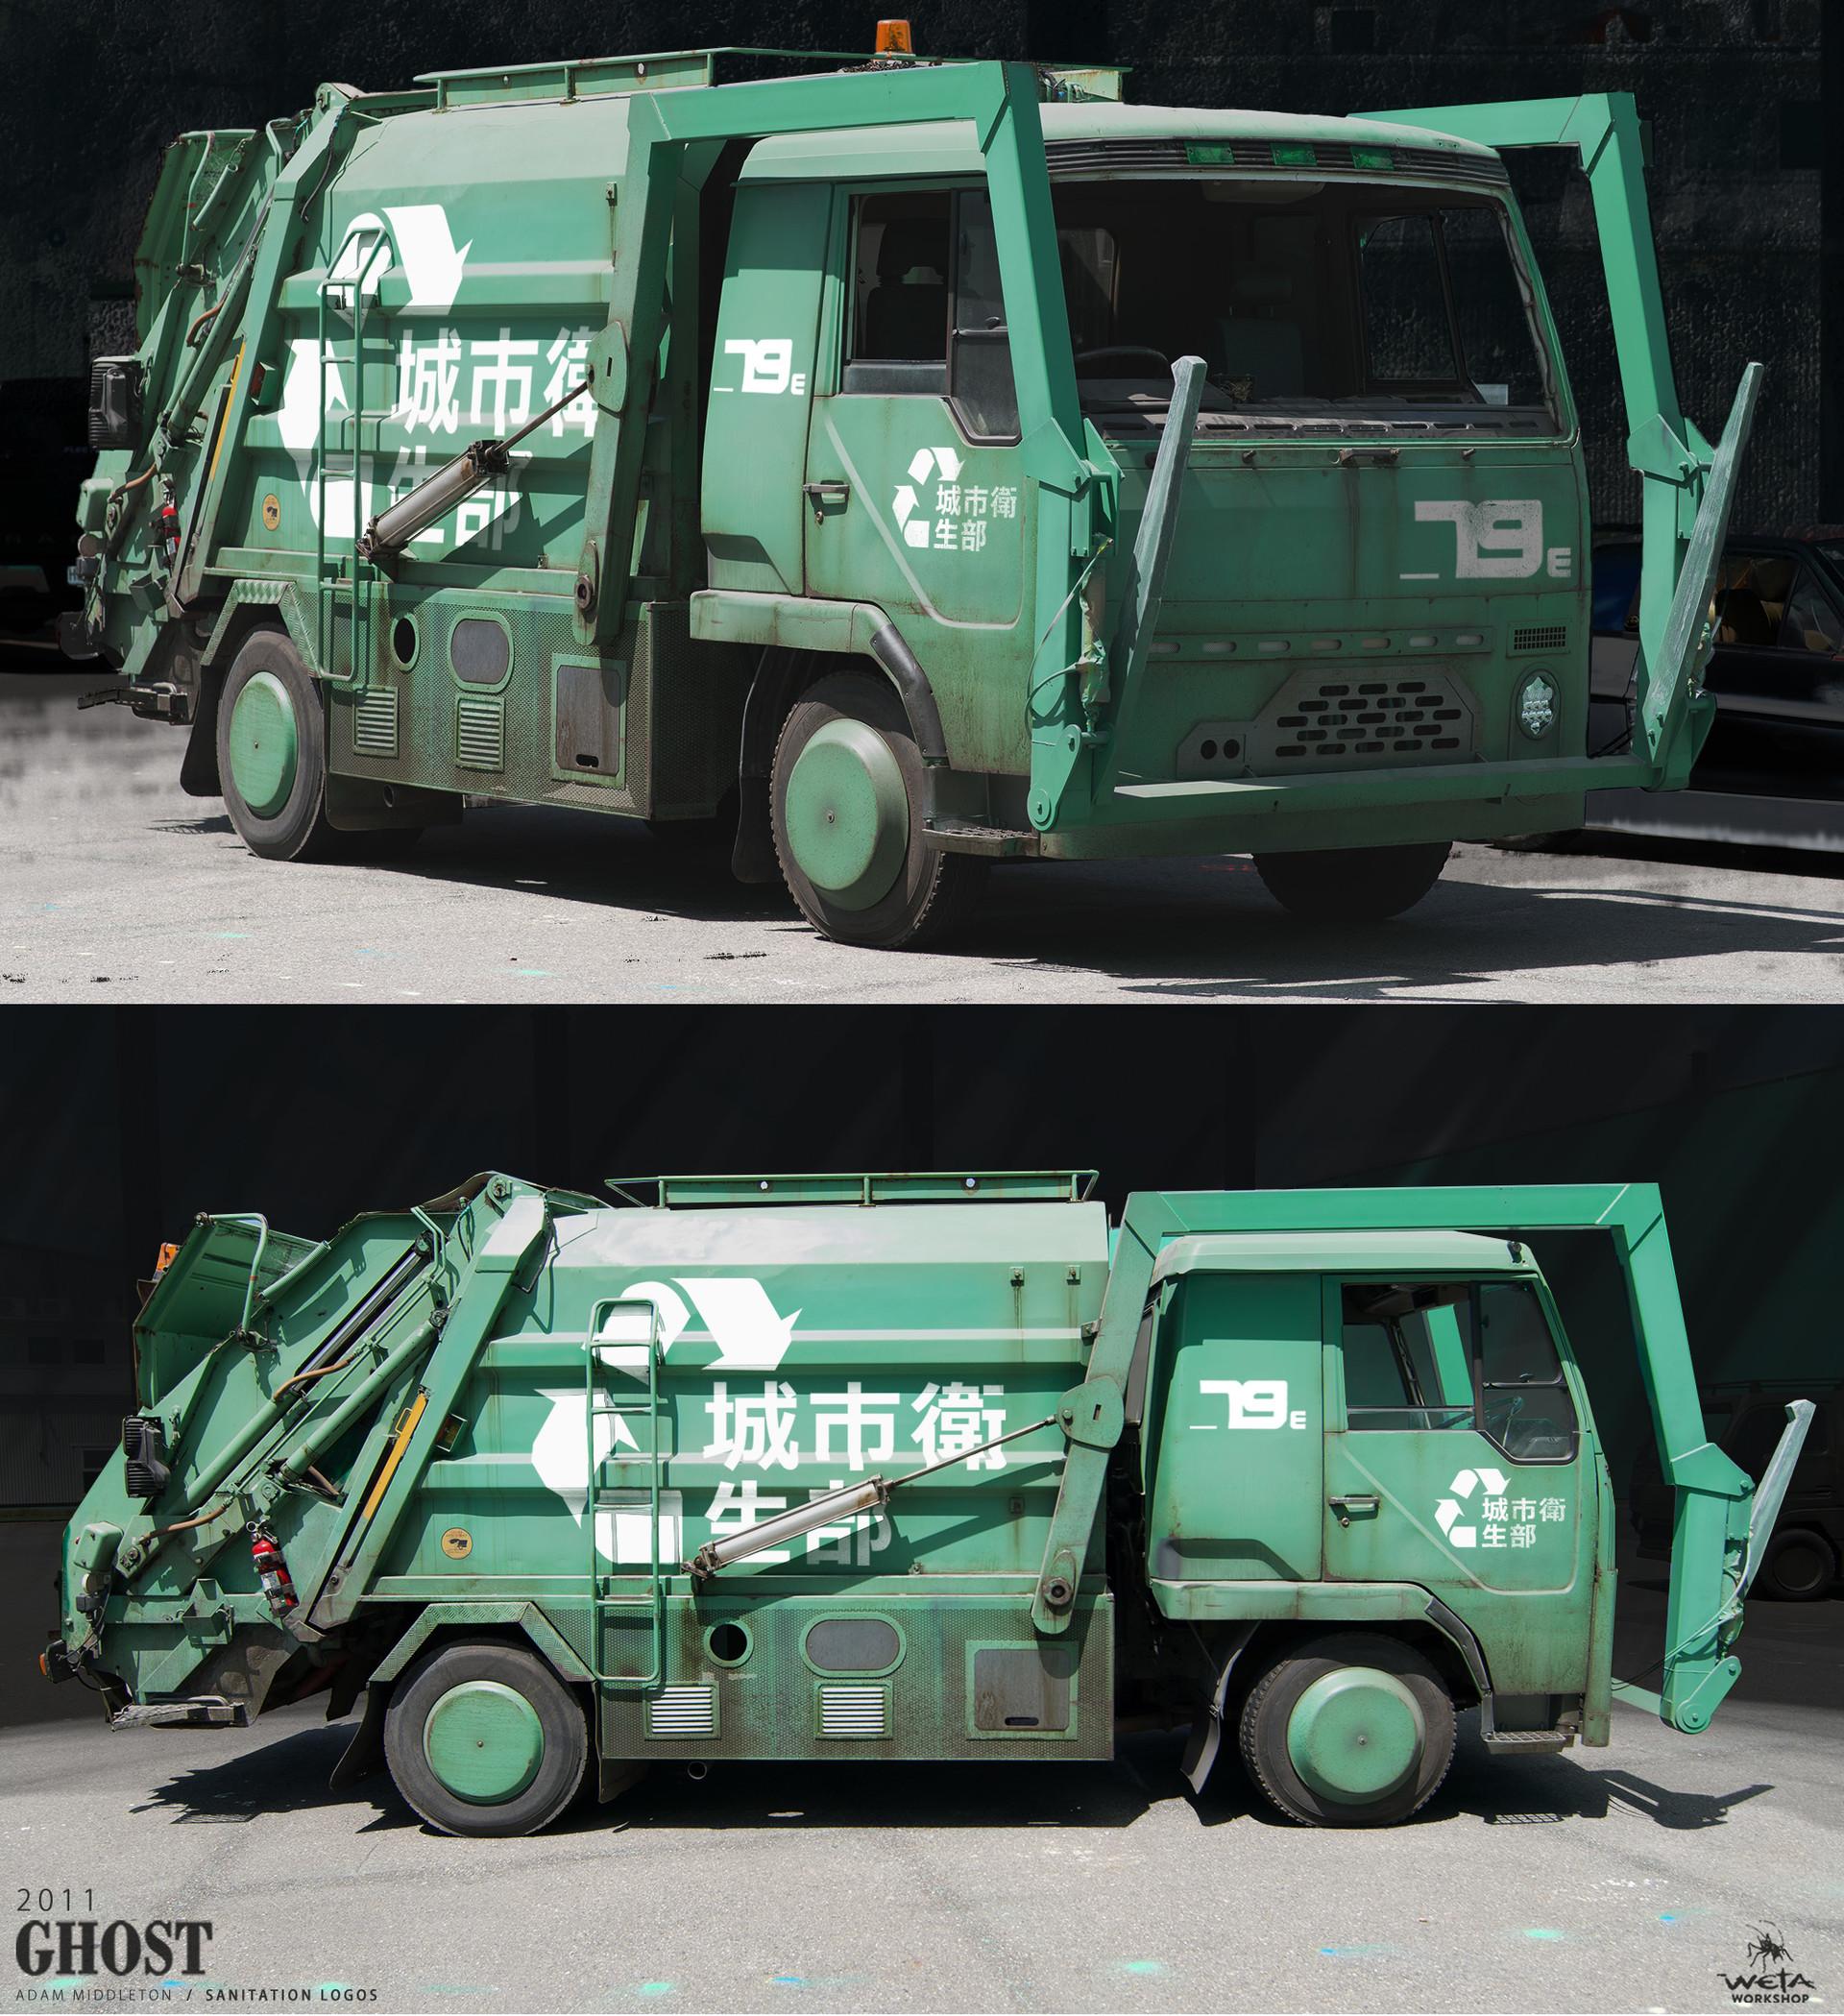 Adam middleton 2011 gs sanitation logos context 06 am wwd